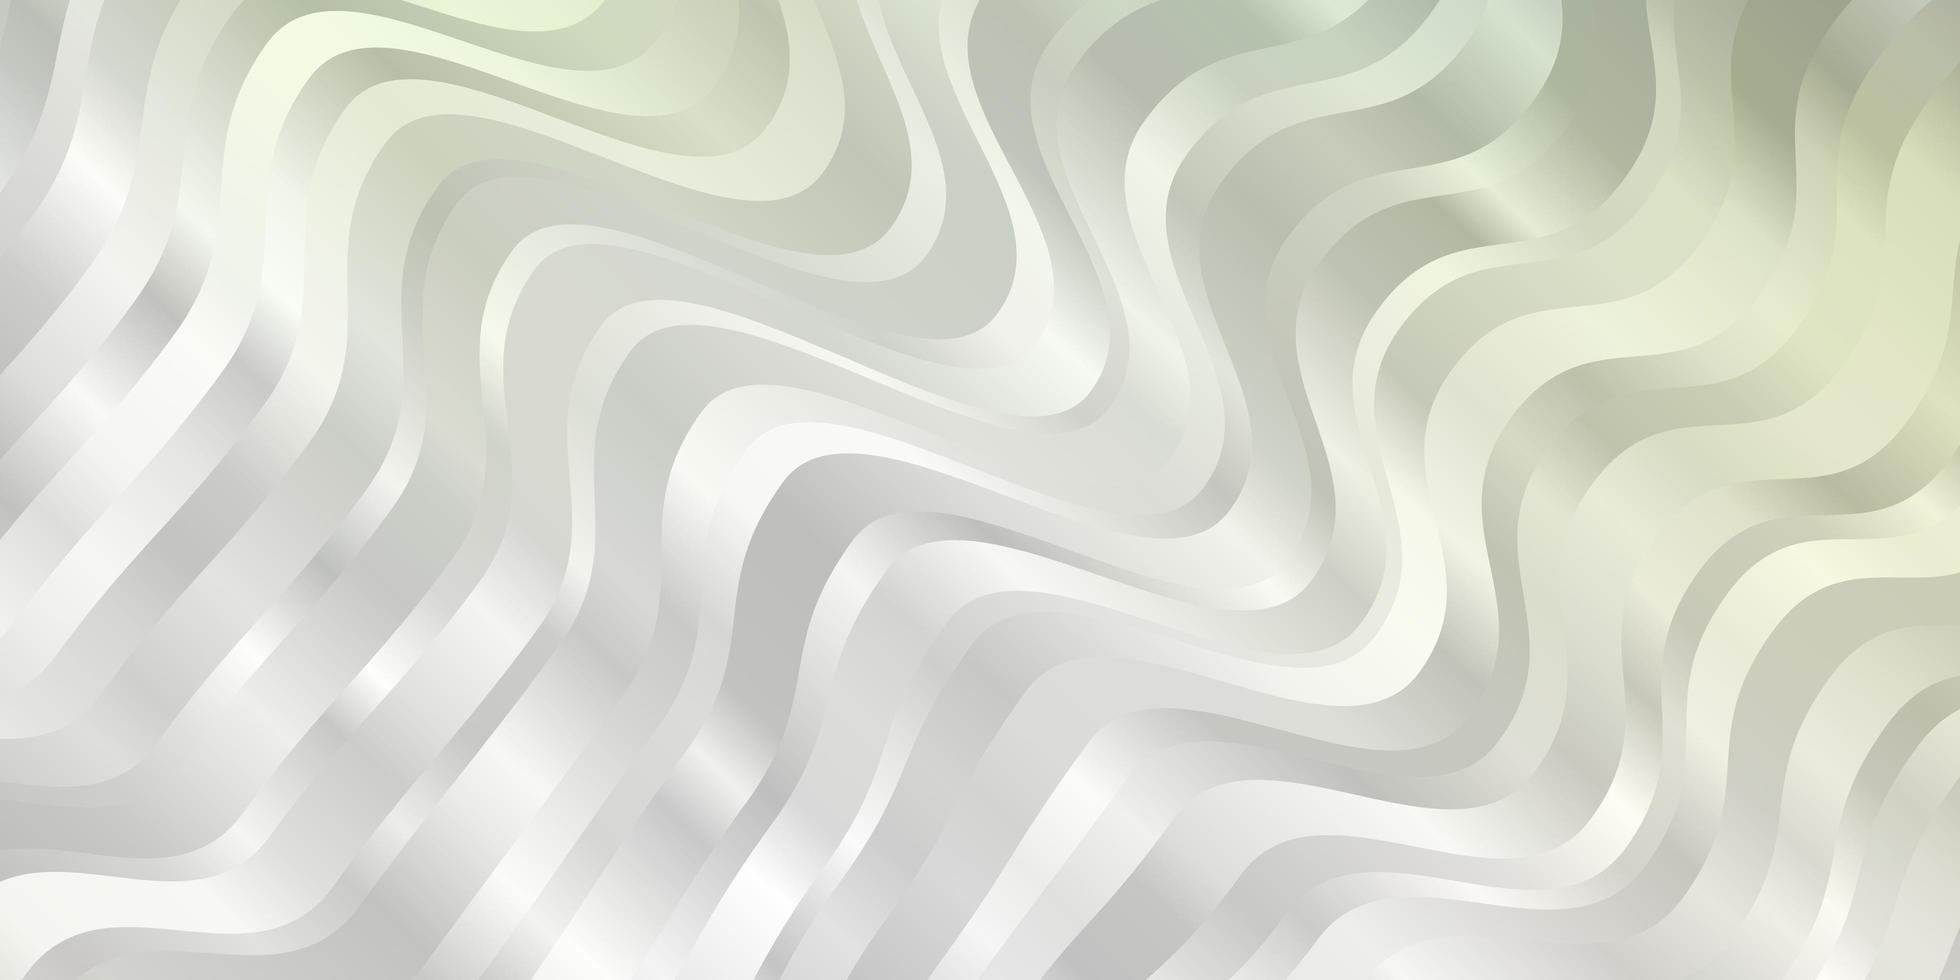 fondo verde claro con arcos. vector